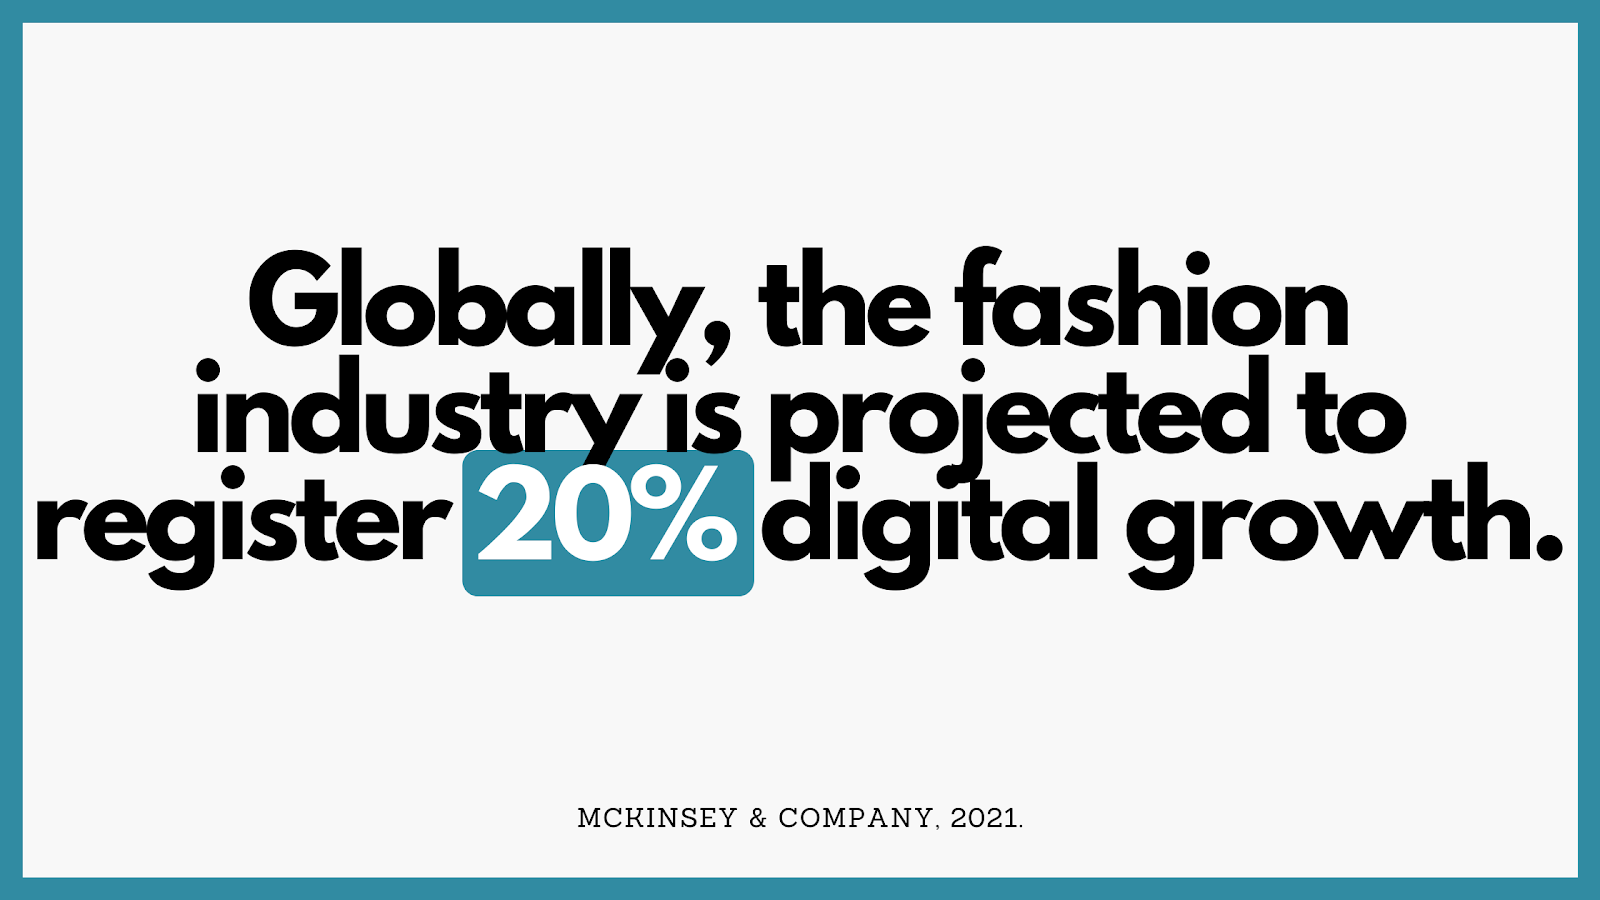 Fashion industry statistics